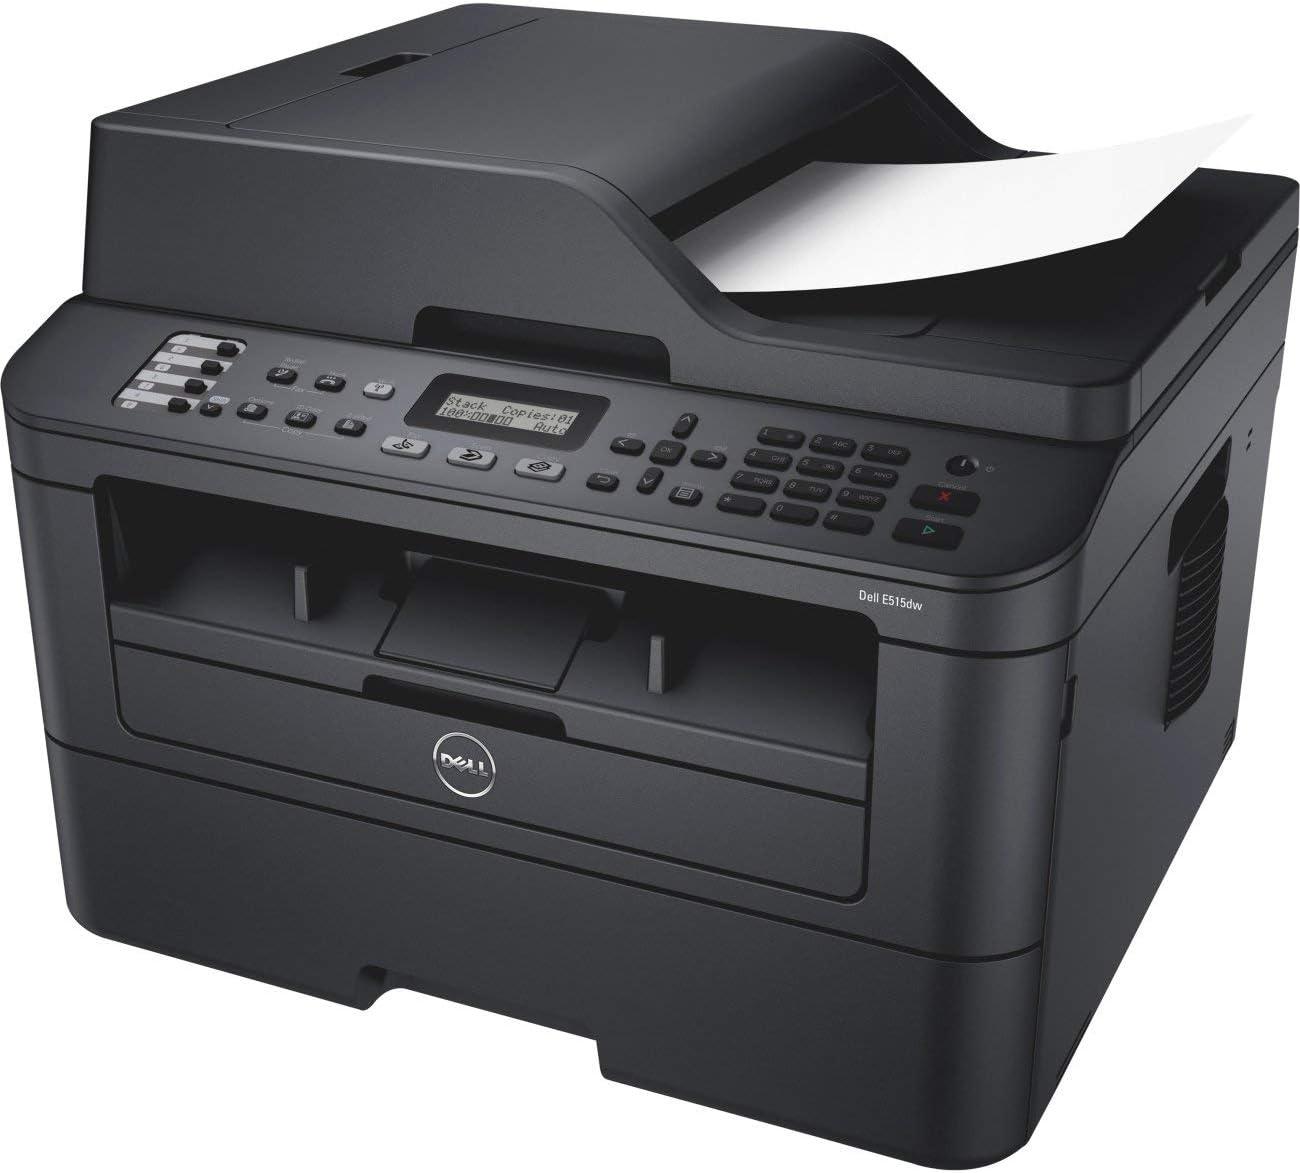 Dell E515dw Monochrome Laser Multifunction Printer (Renewed)